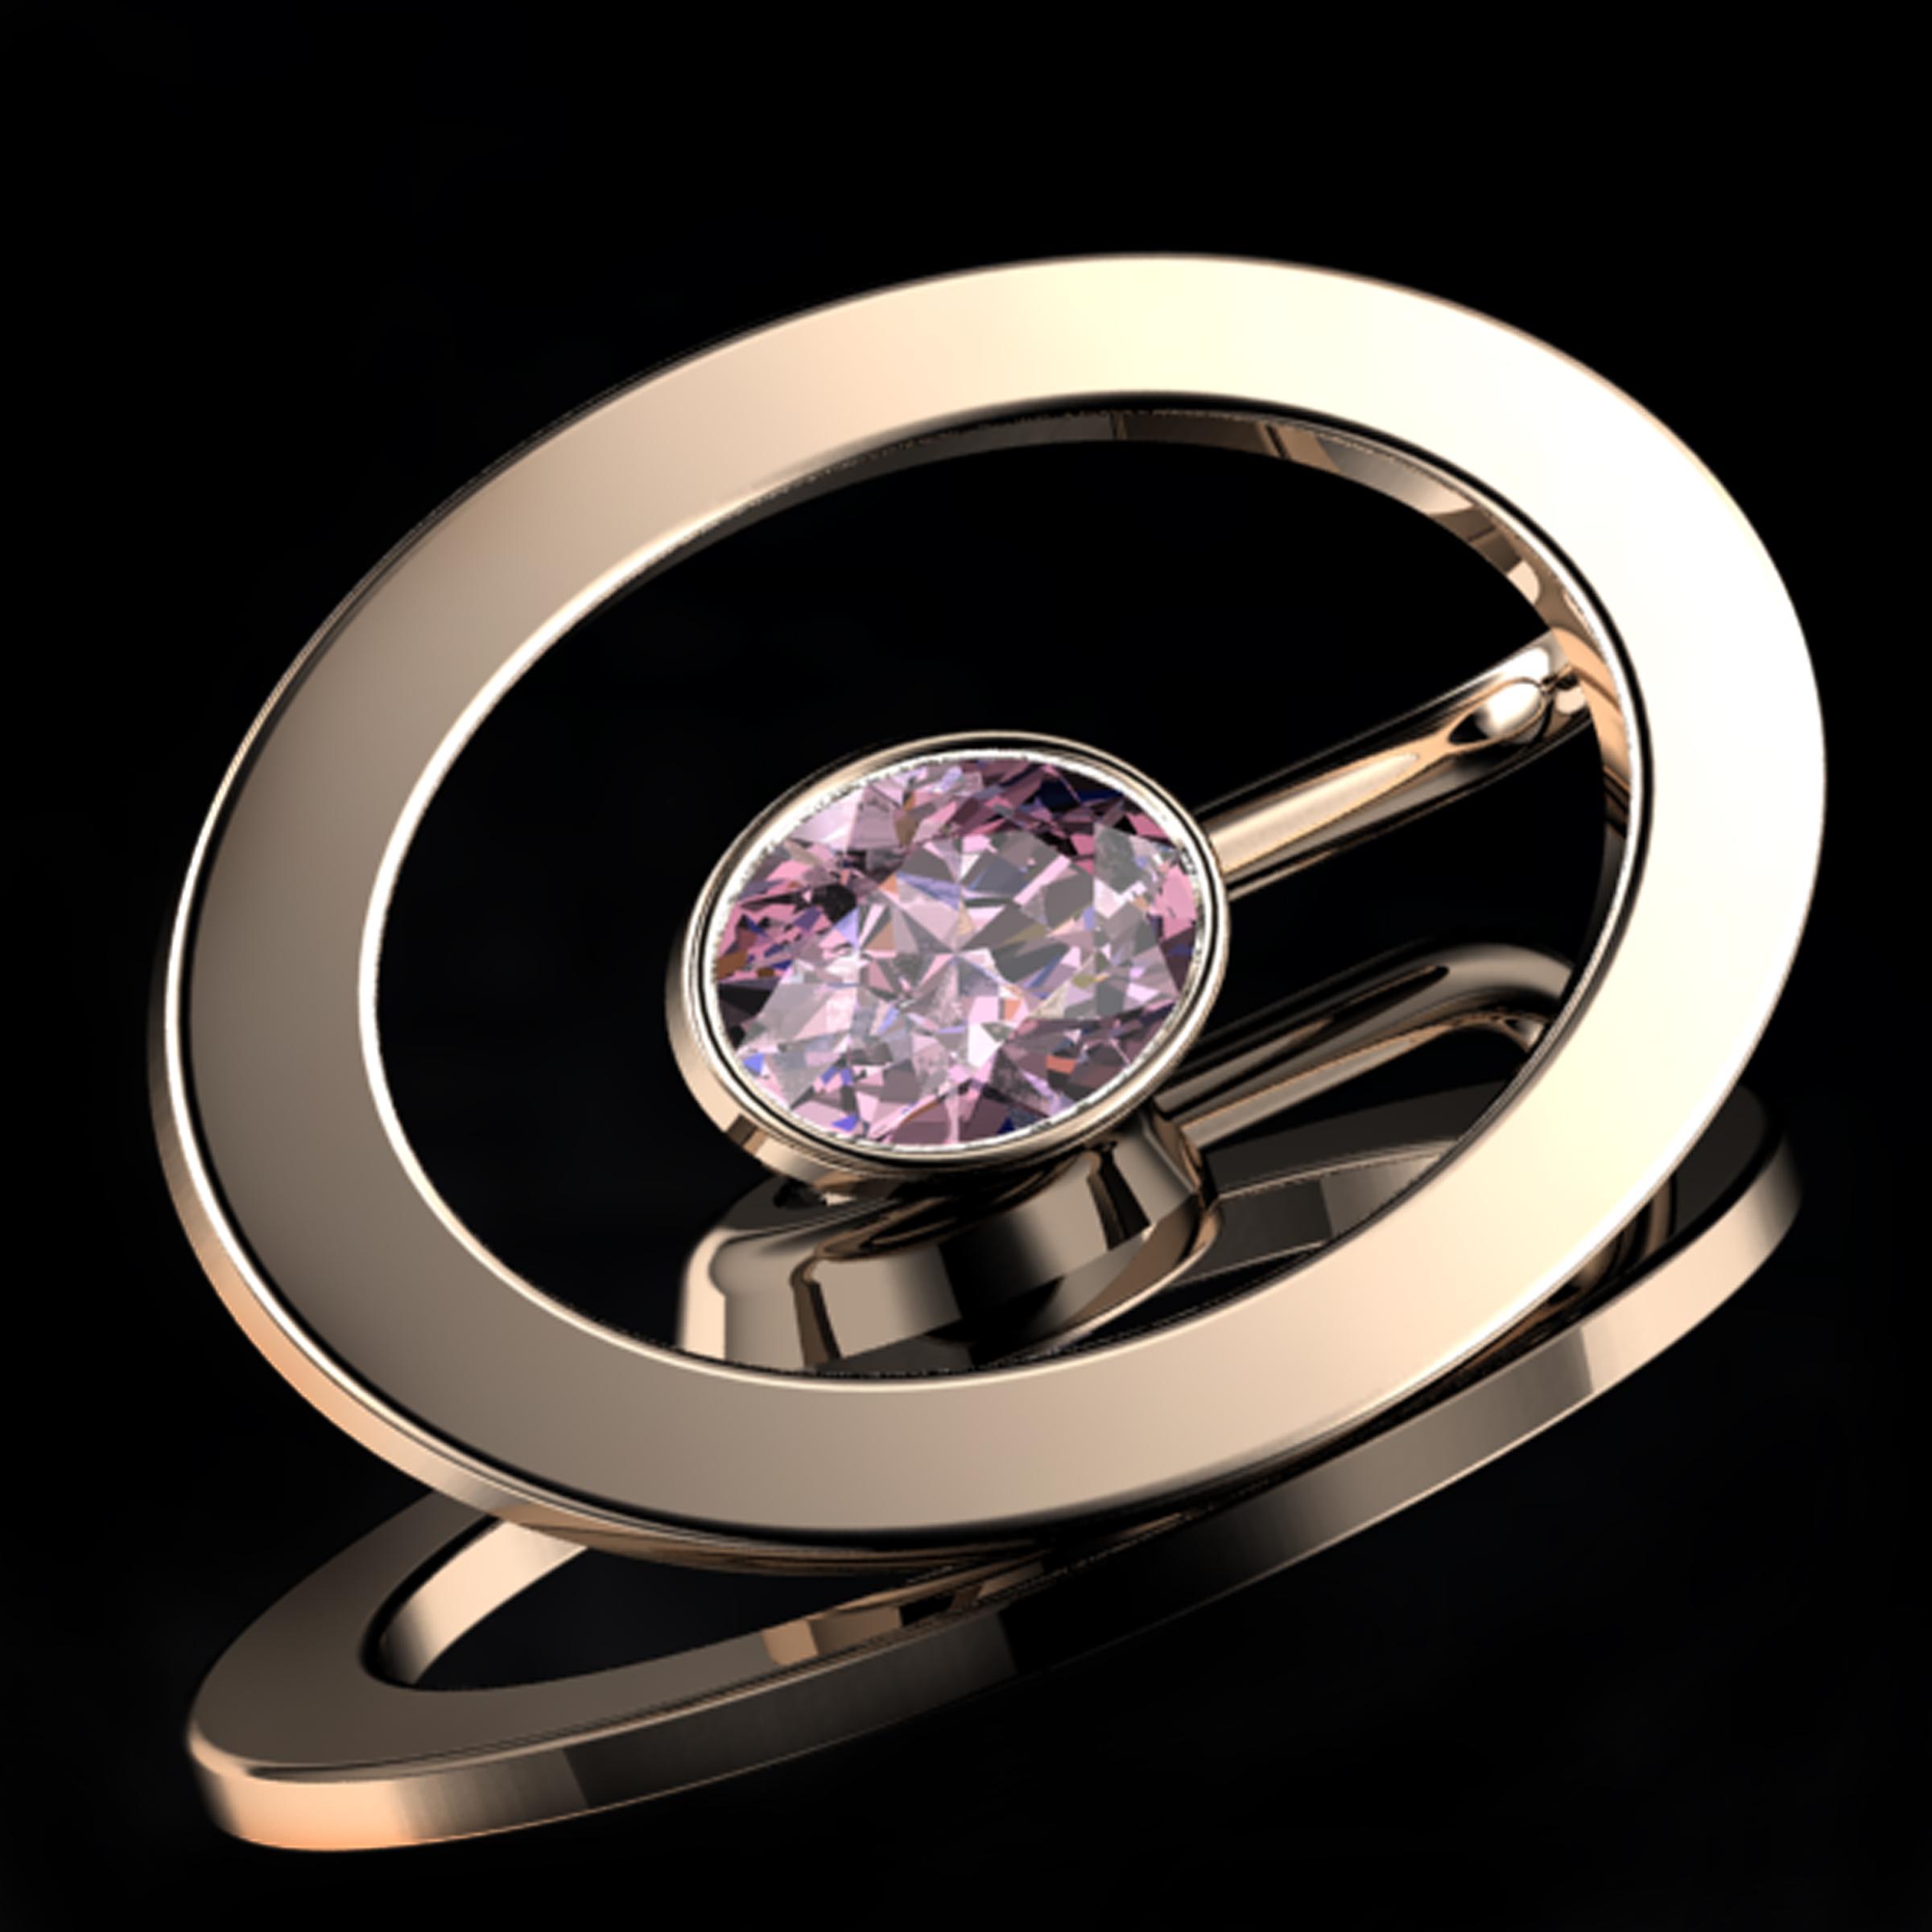 'ETERNO OVAL'® VIVID-PINK   Natural Oval-Cut Diamond • 0.64 Carats • Fancy Intense Pink / VS1 (G.I.A) • 18K Rose Gold